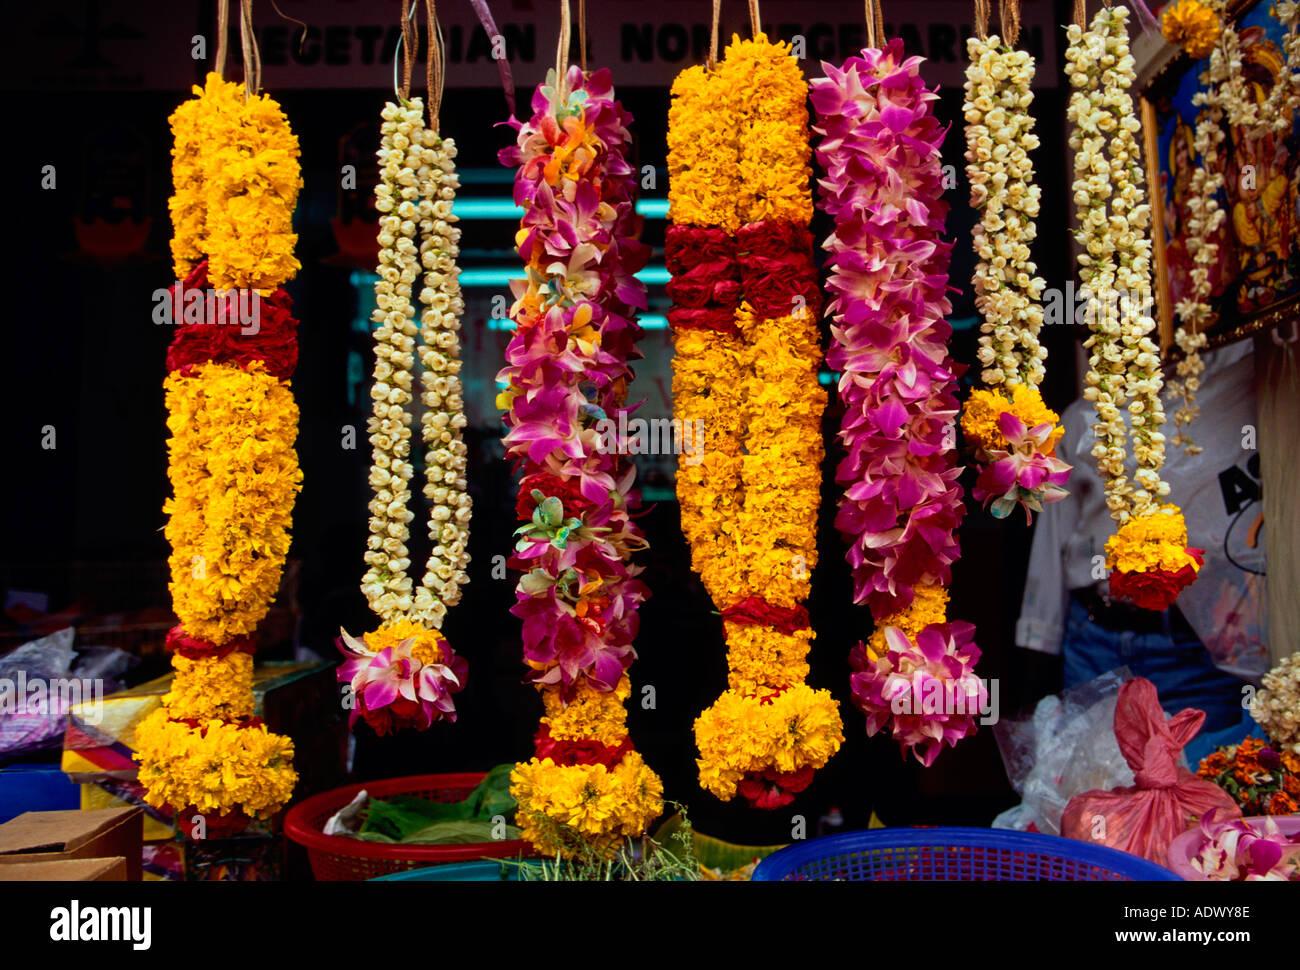 Flower garland flower garlands flowers wreath flower shop flower garland flower garlands flowers wreath flower shop little india little india district singapore southeast asia izmirmasajfo Gallery